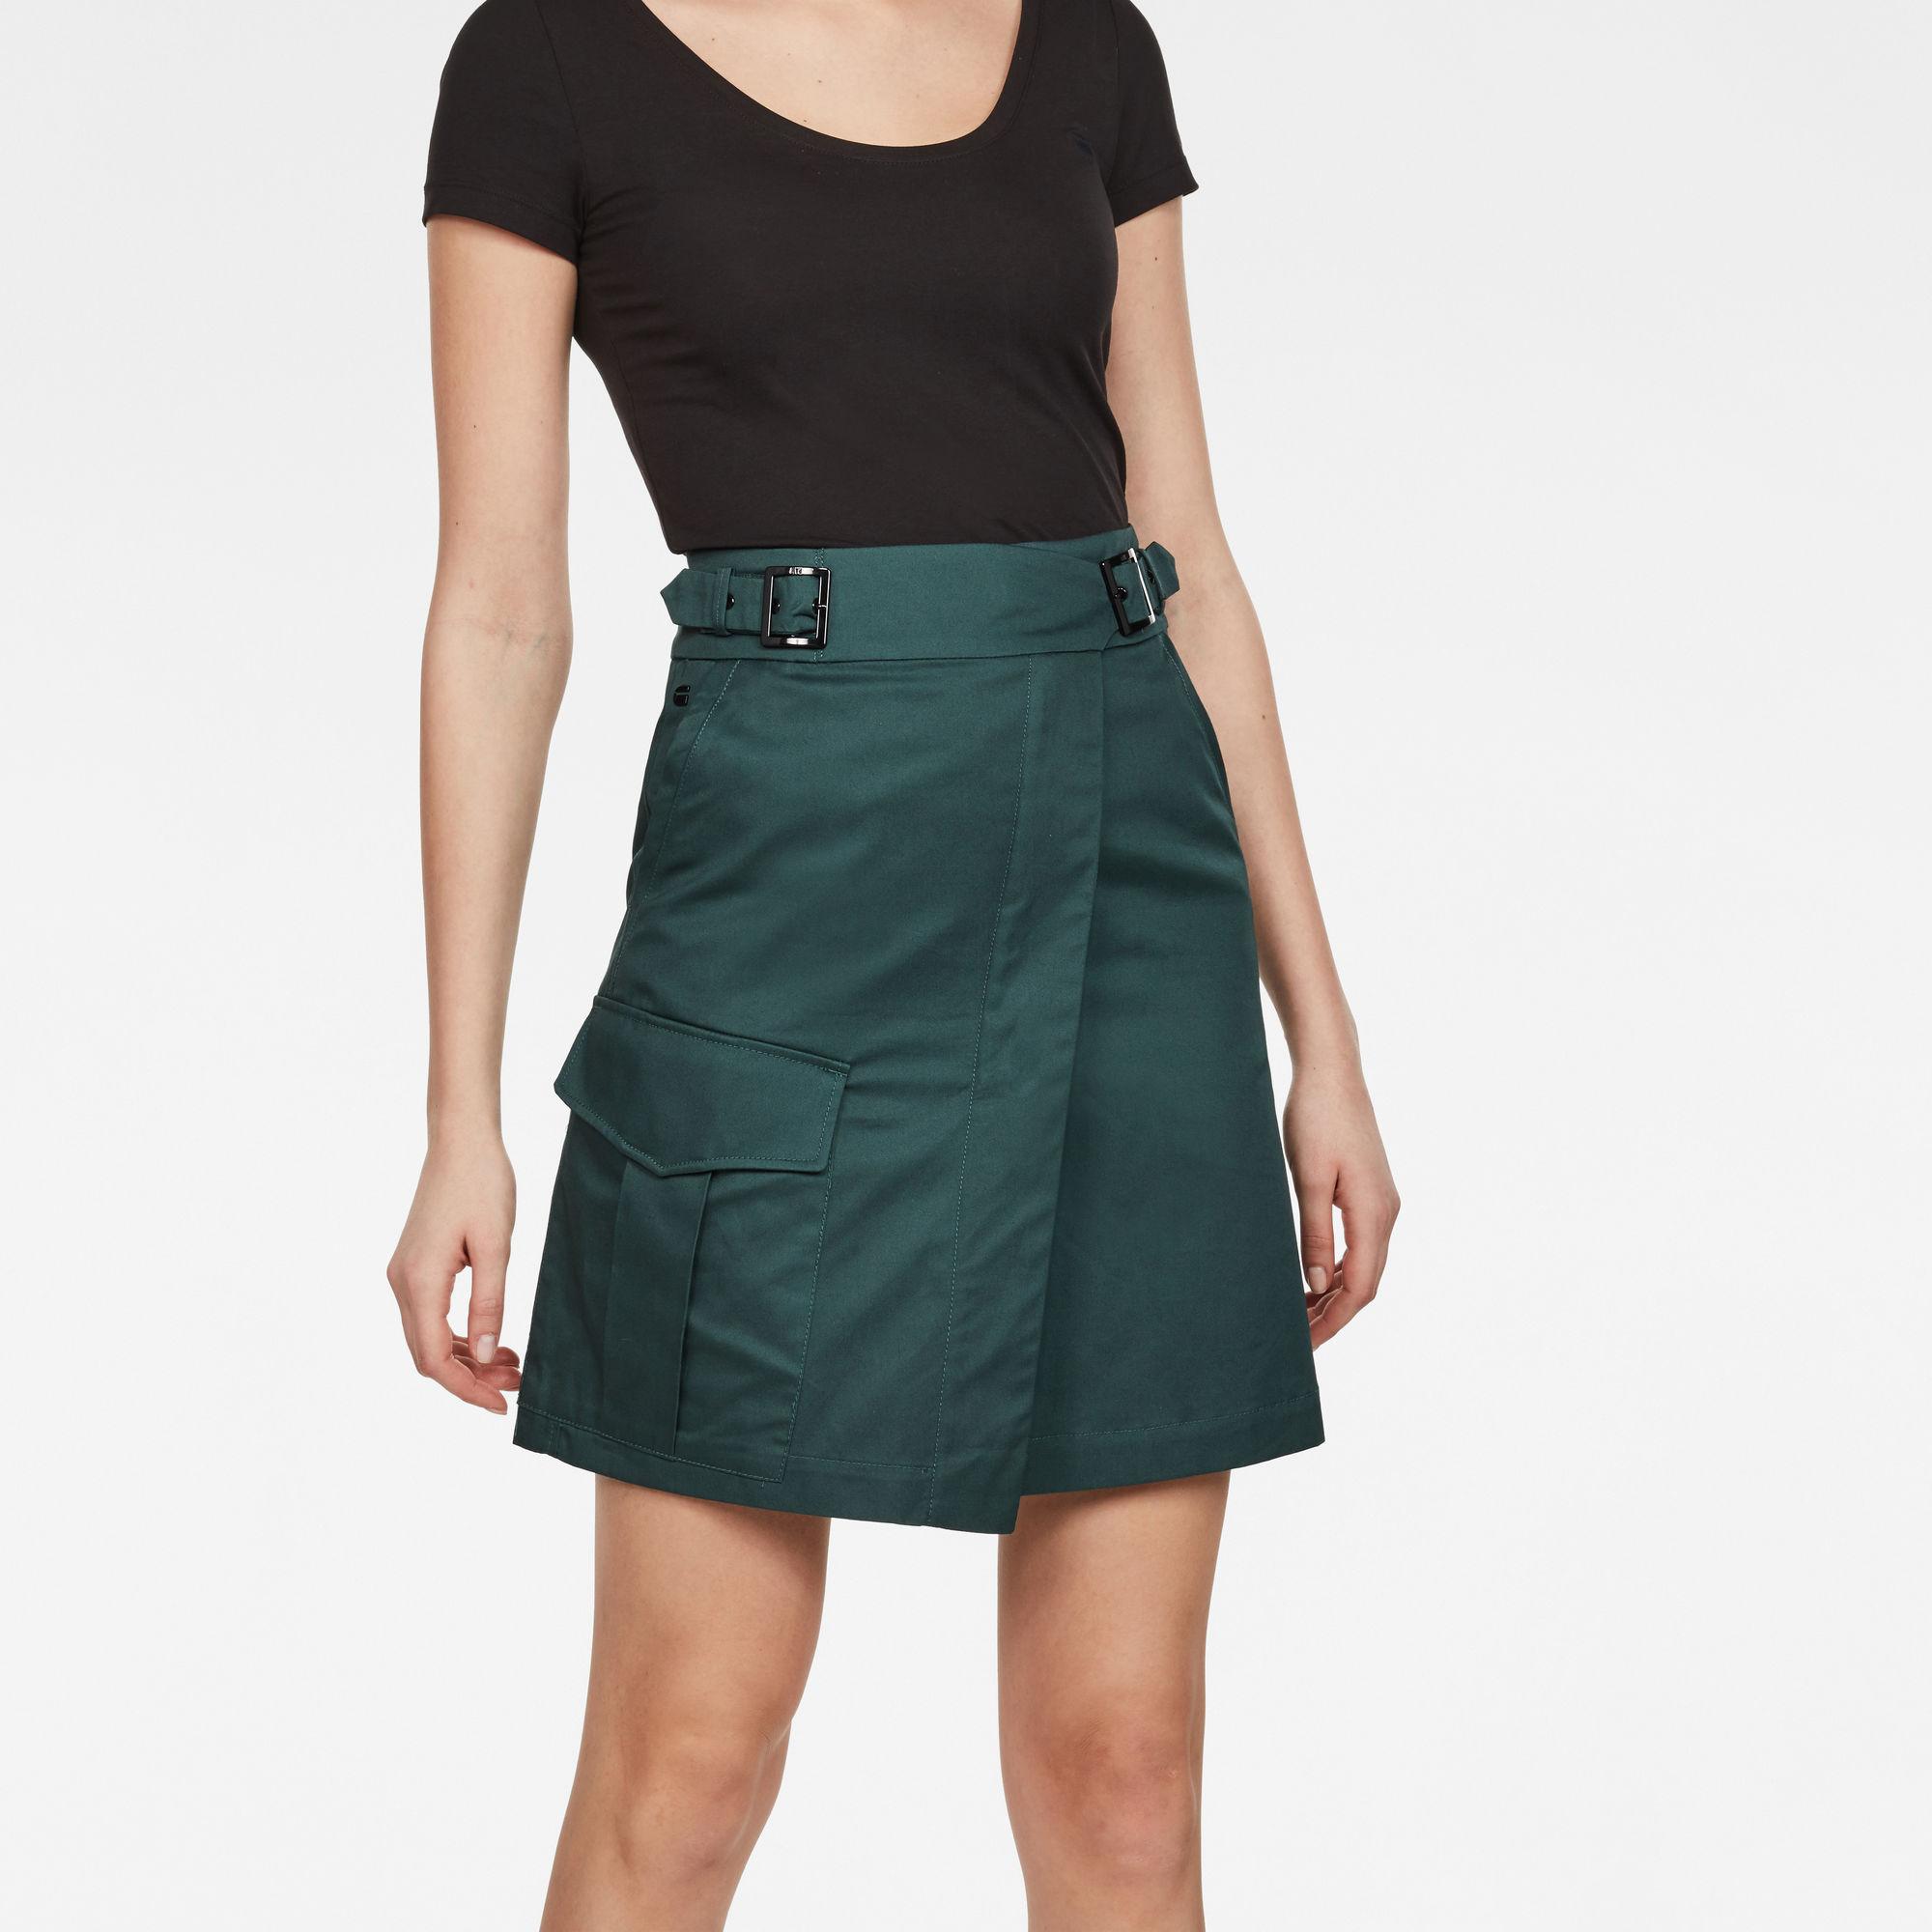 Image of G Star Raw Bristum Army Wrap Skirt